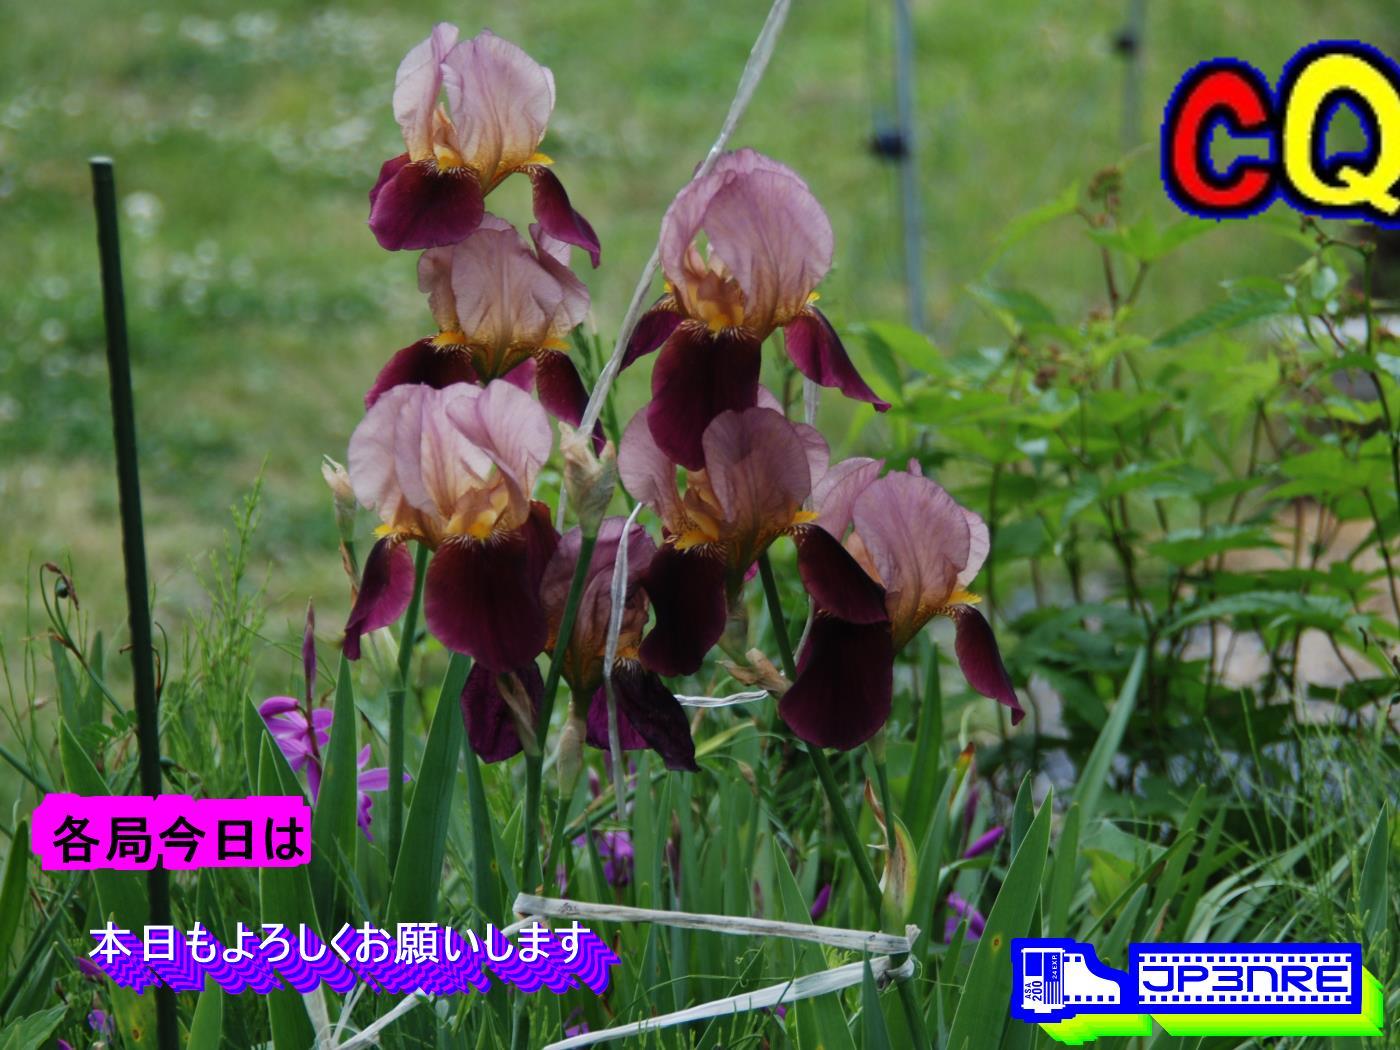 JF1RYU/